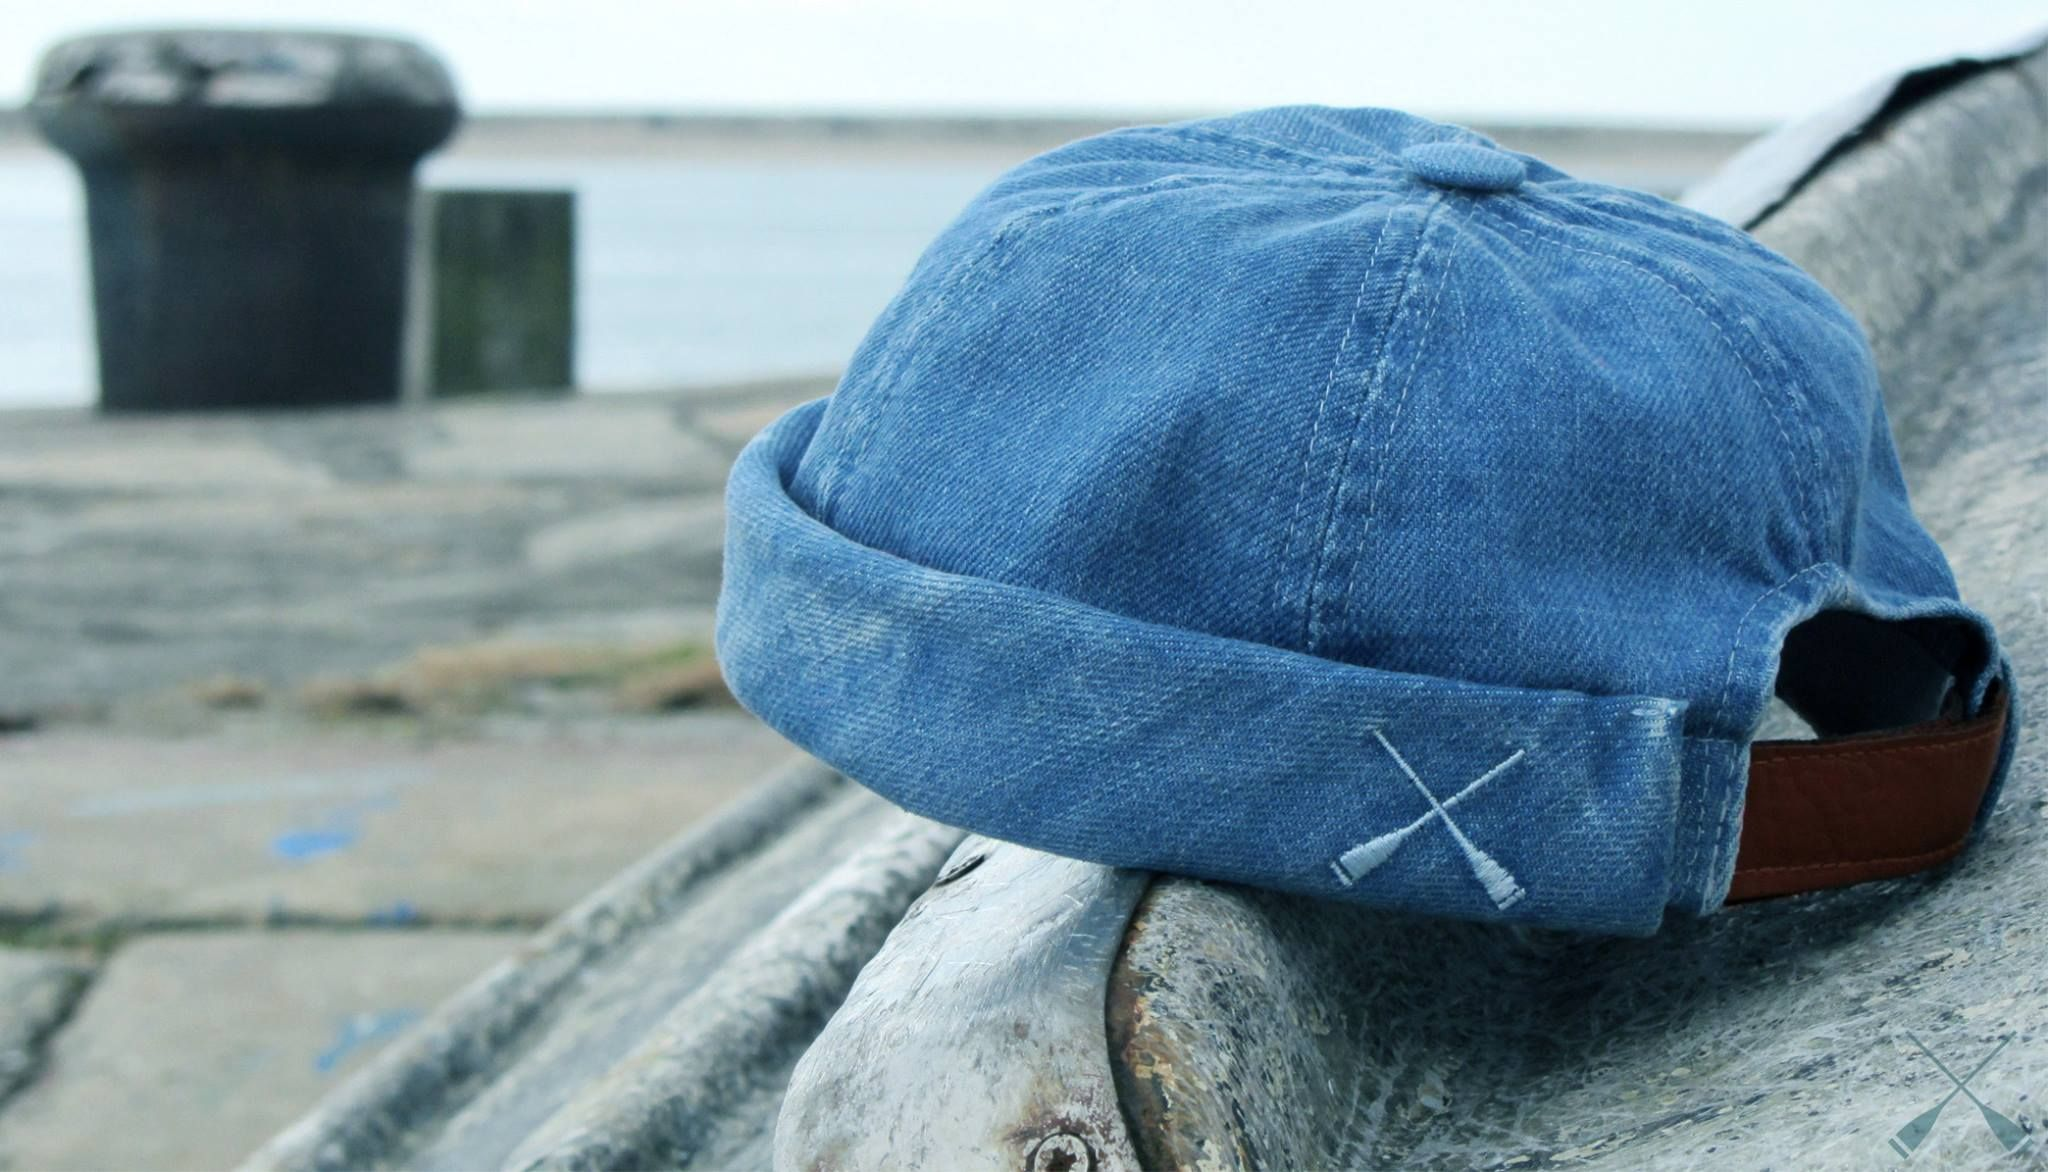 cd743316a45 Beton Cire Washed Denim Miki Cap Menswear Hats